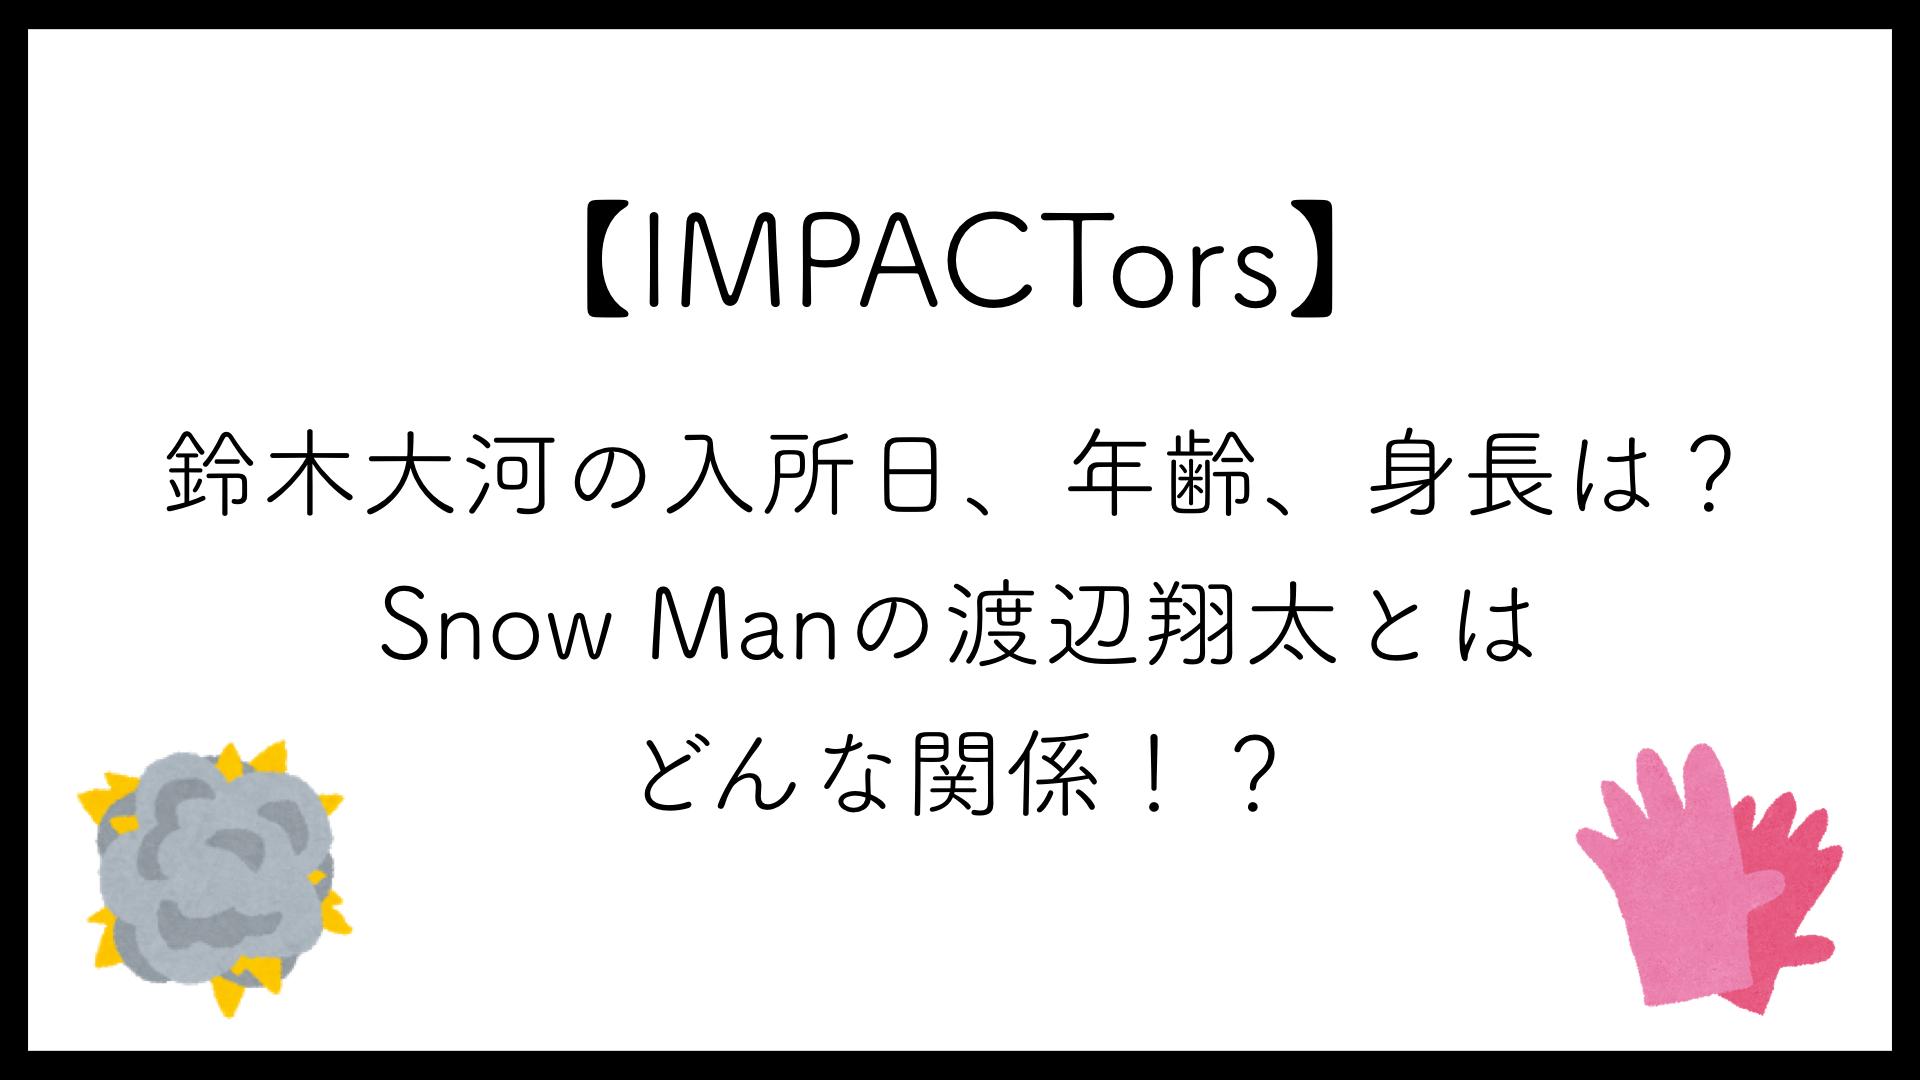 【IMPACTors】鈴木大河の入所日、年齢、身長は?Snow Manの渡辺翔太とはどんな関係!?